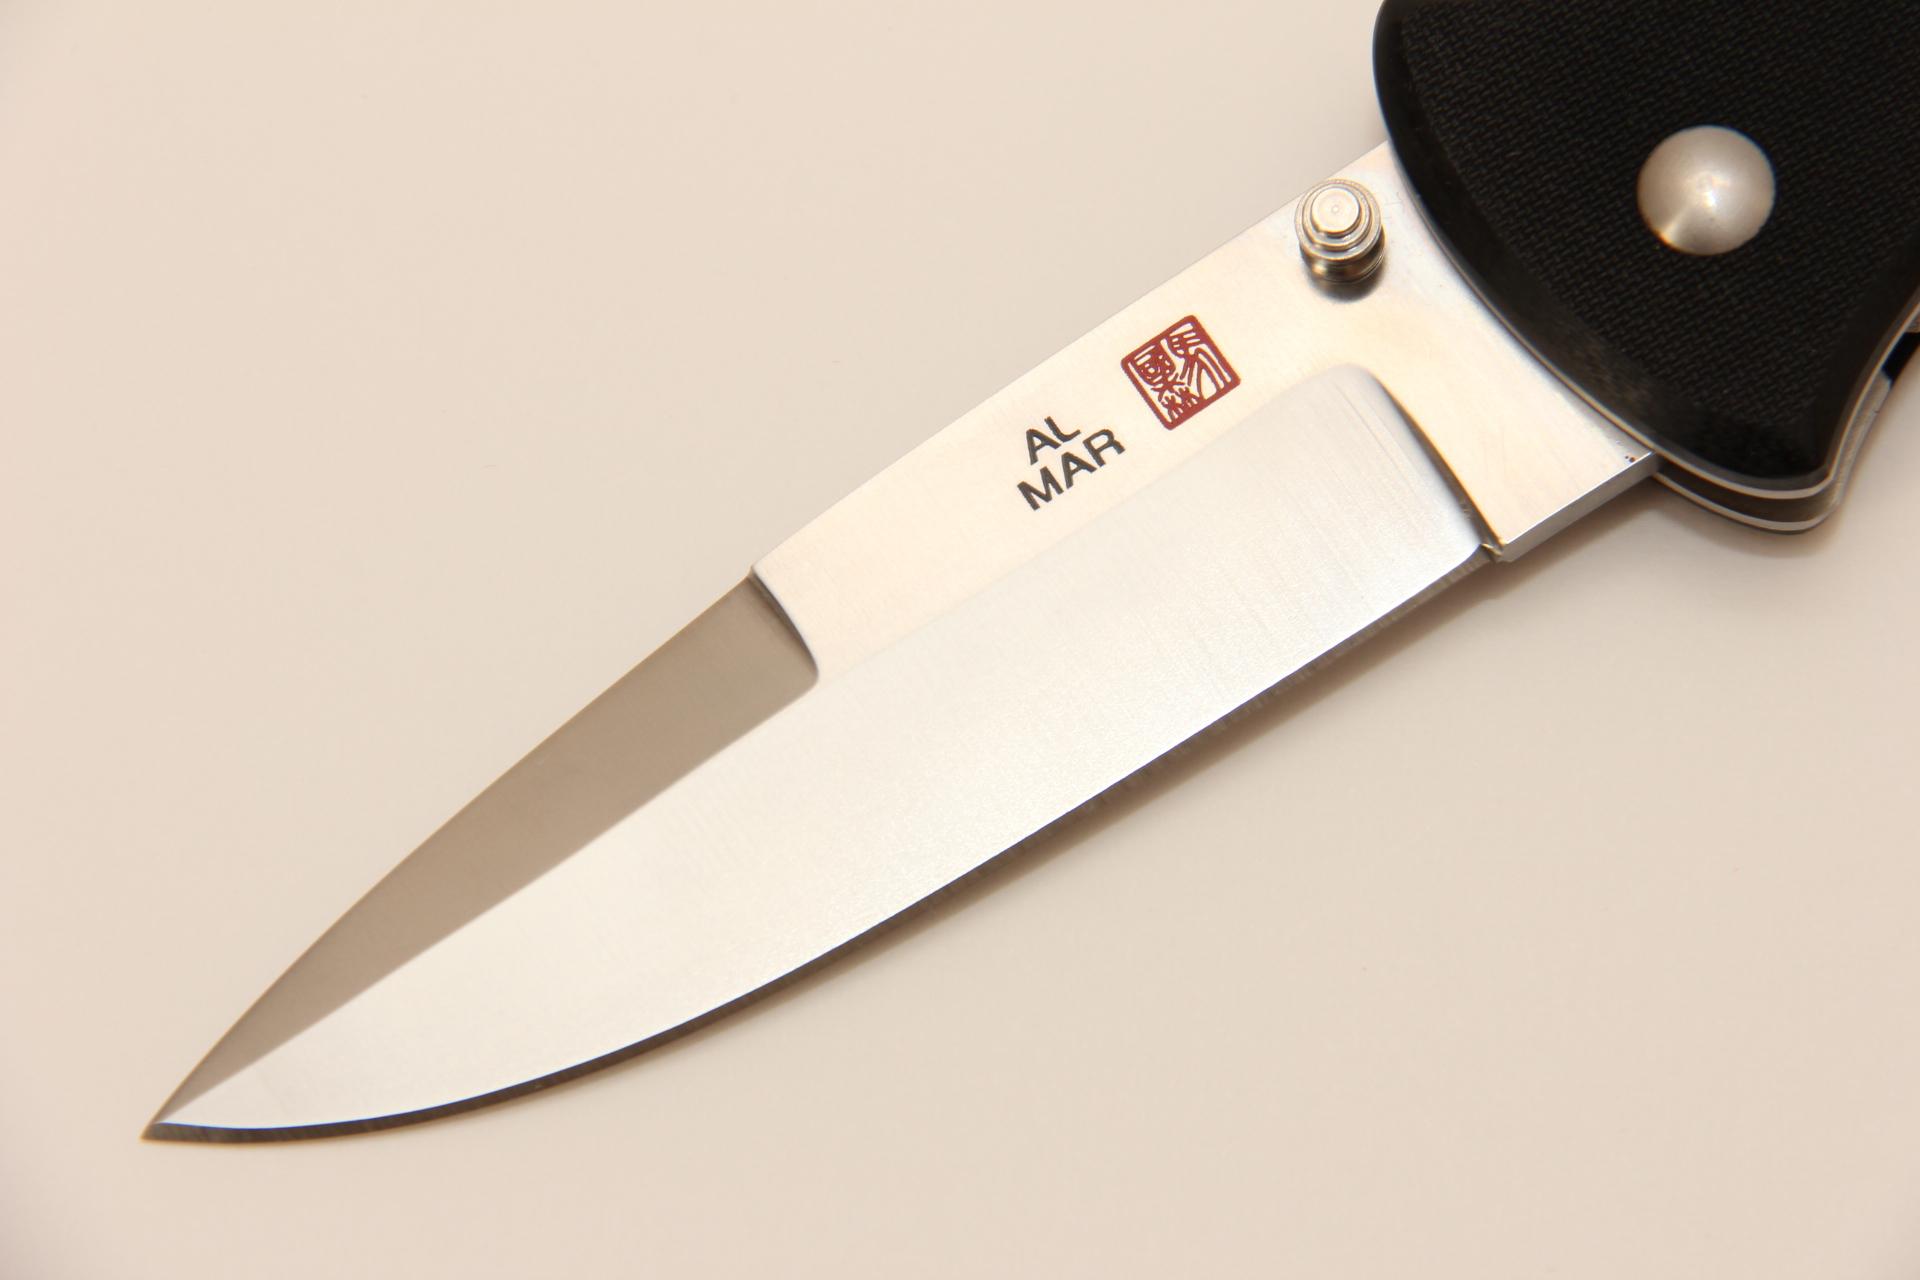 Нож Al Mar AMS2K - фотография